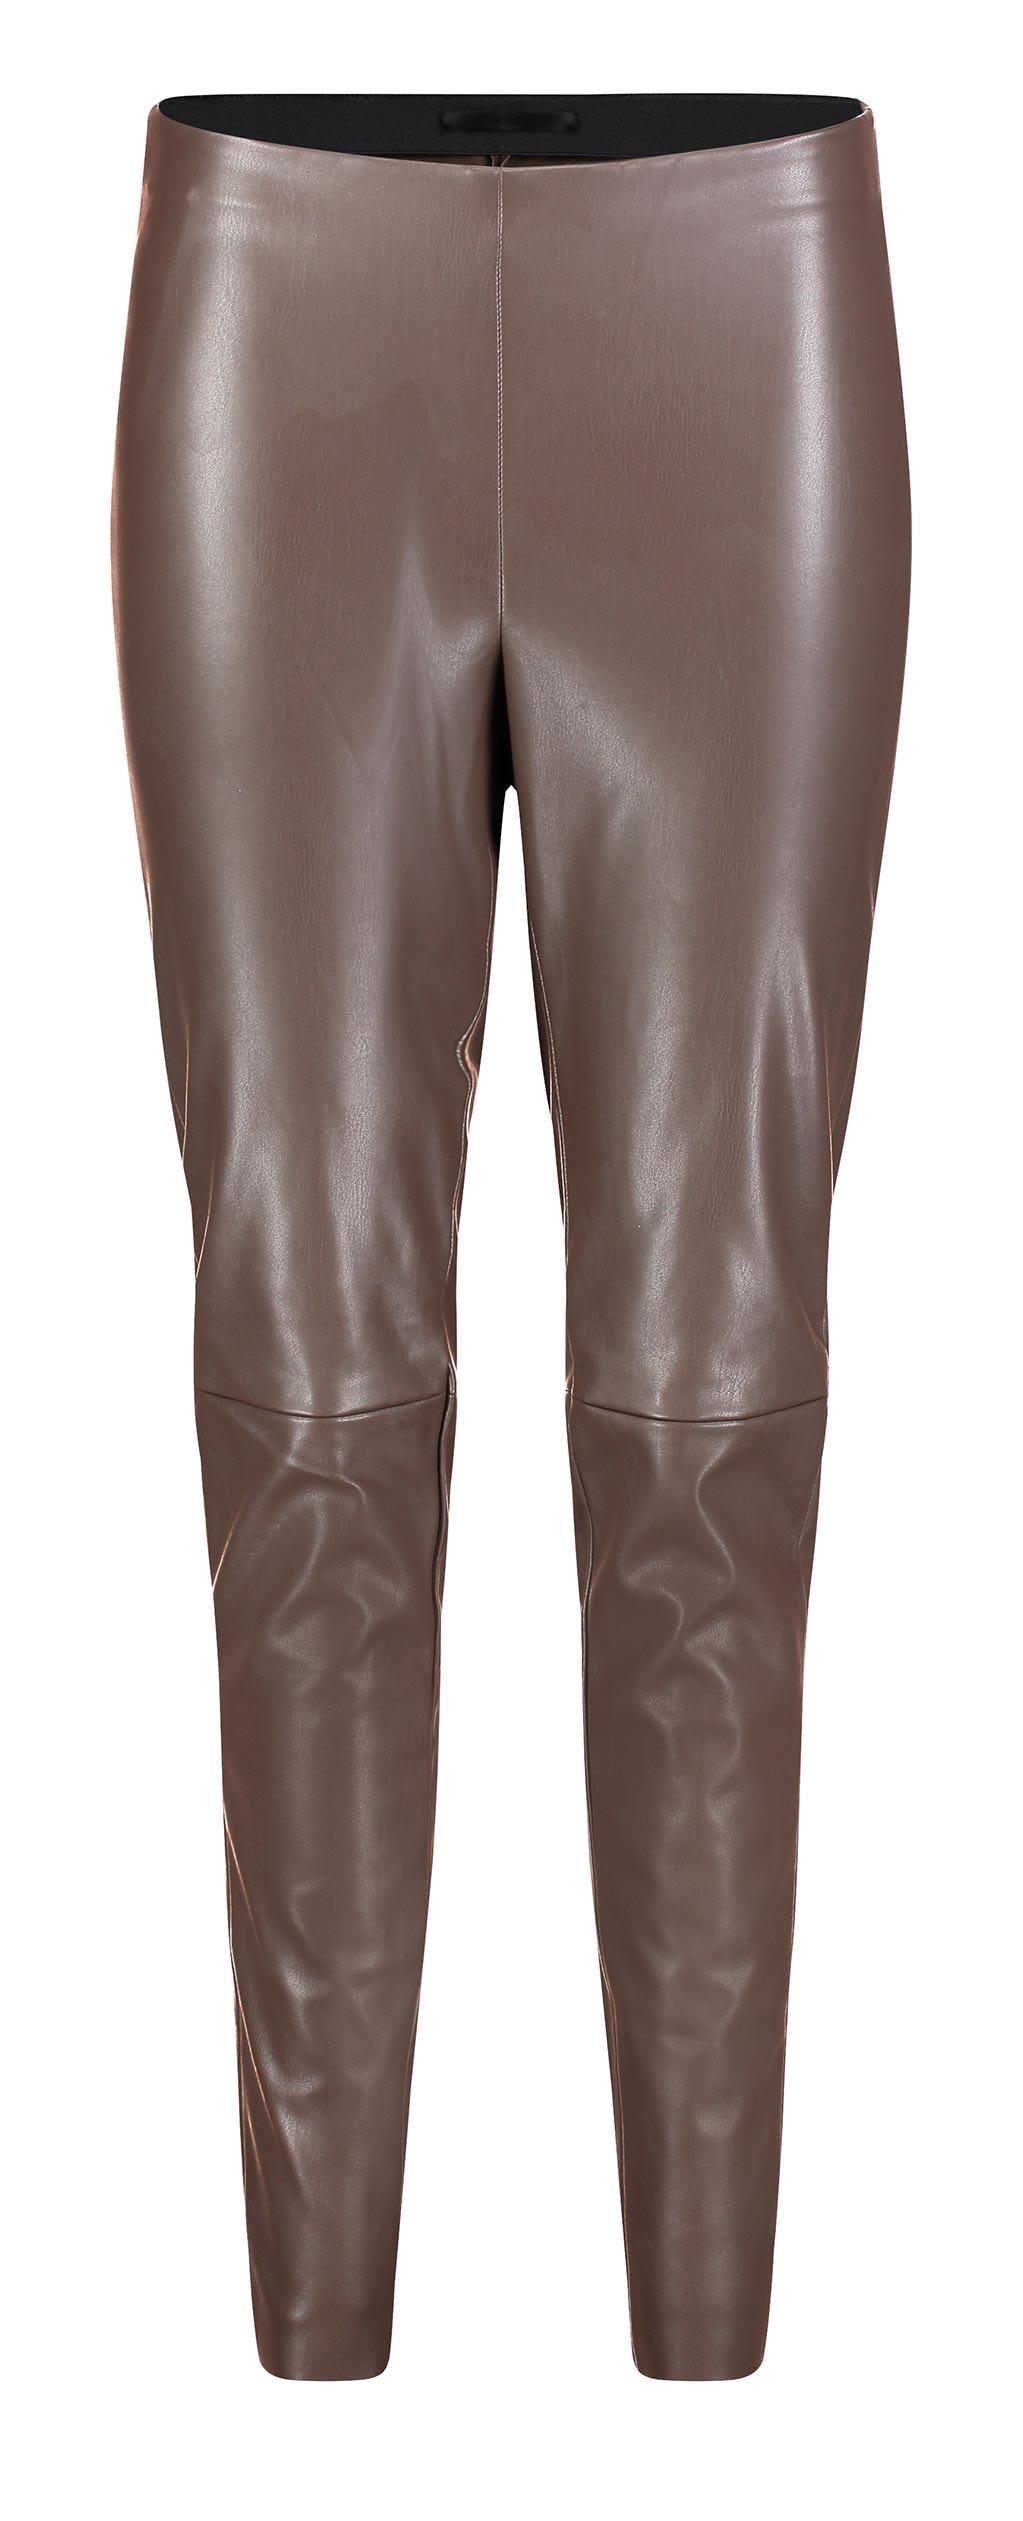 MAC JEANS - LEGGING leather, Vegan Leather